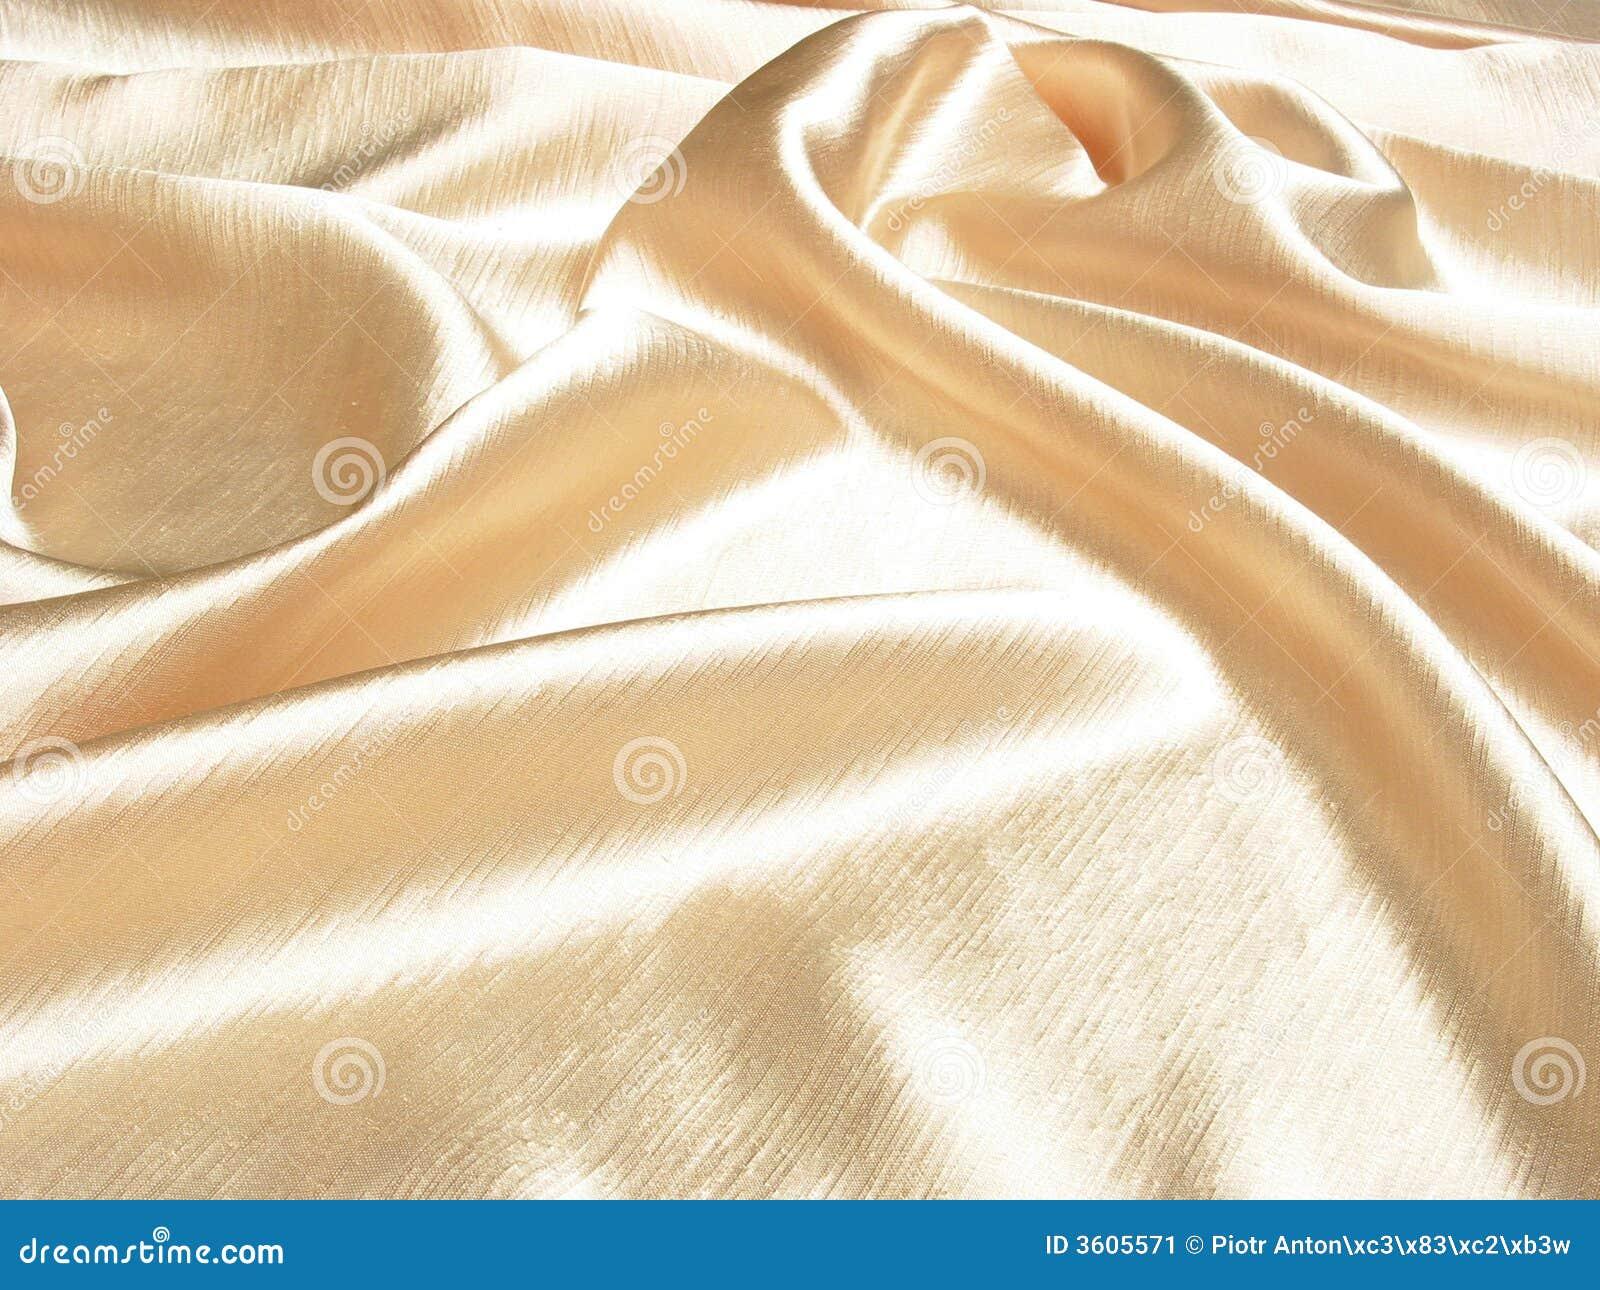 gold satin background - photo #14